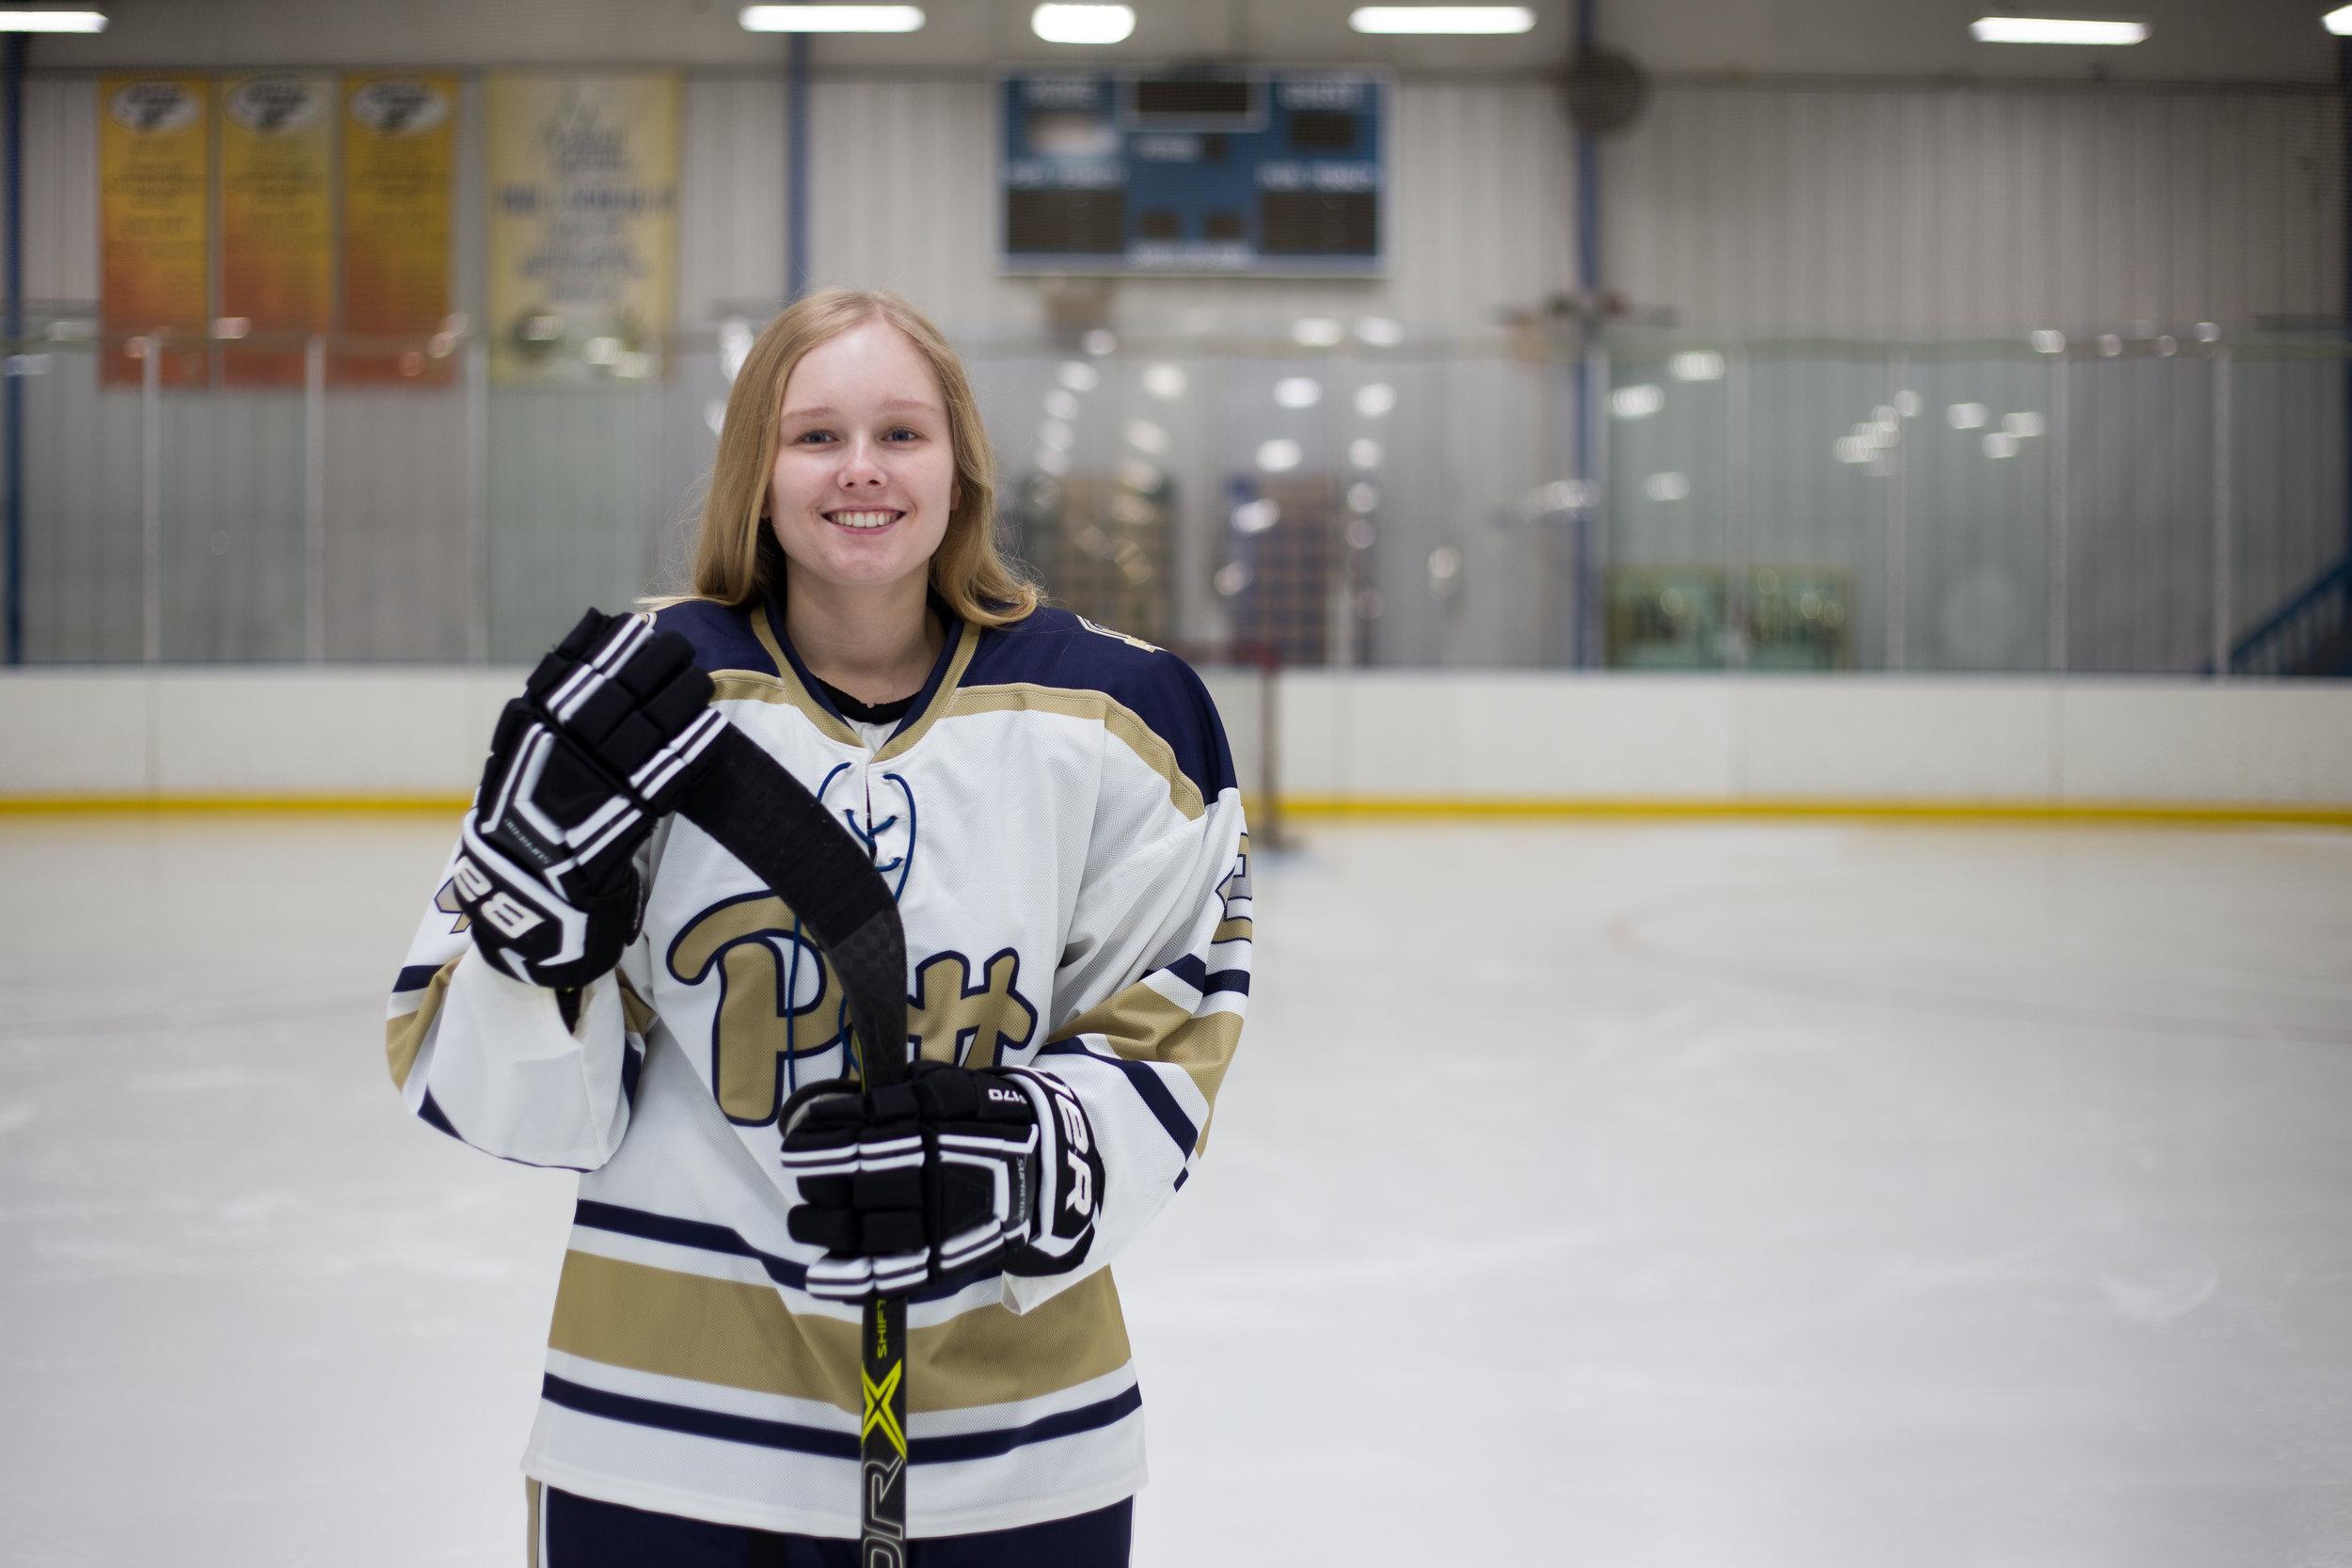 hockeyPortraits-29.JPG